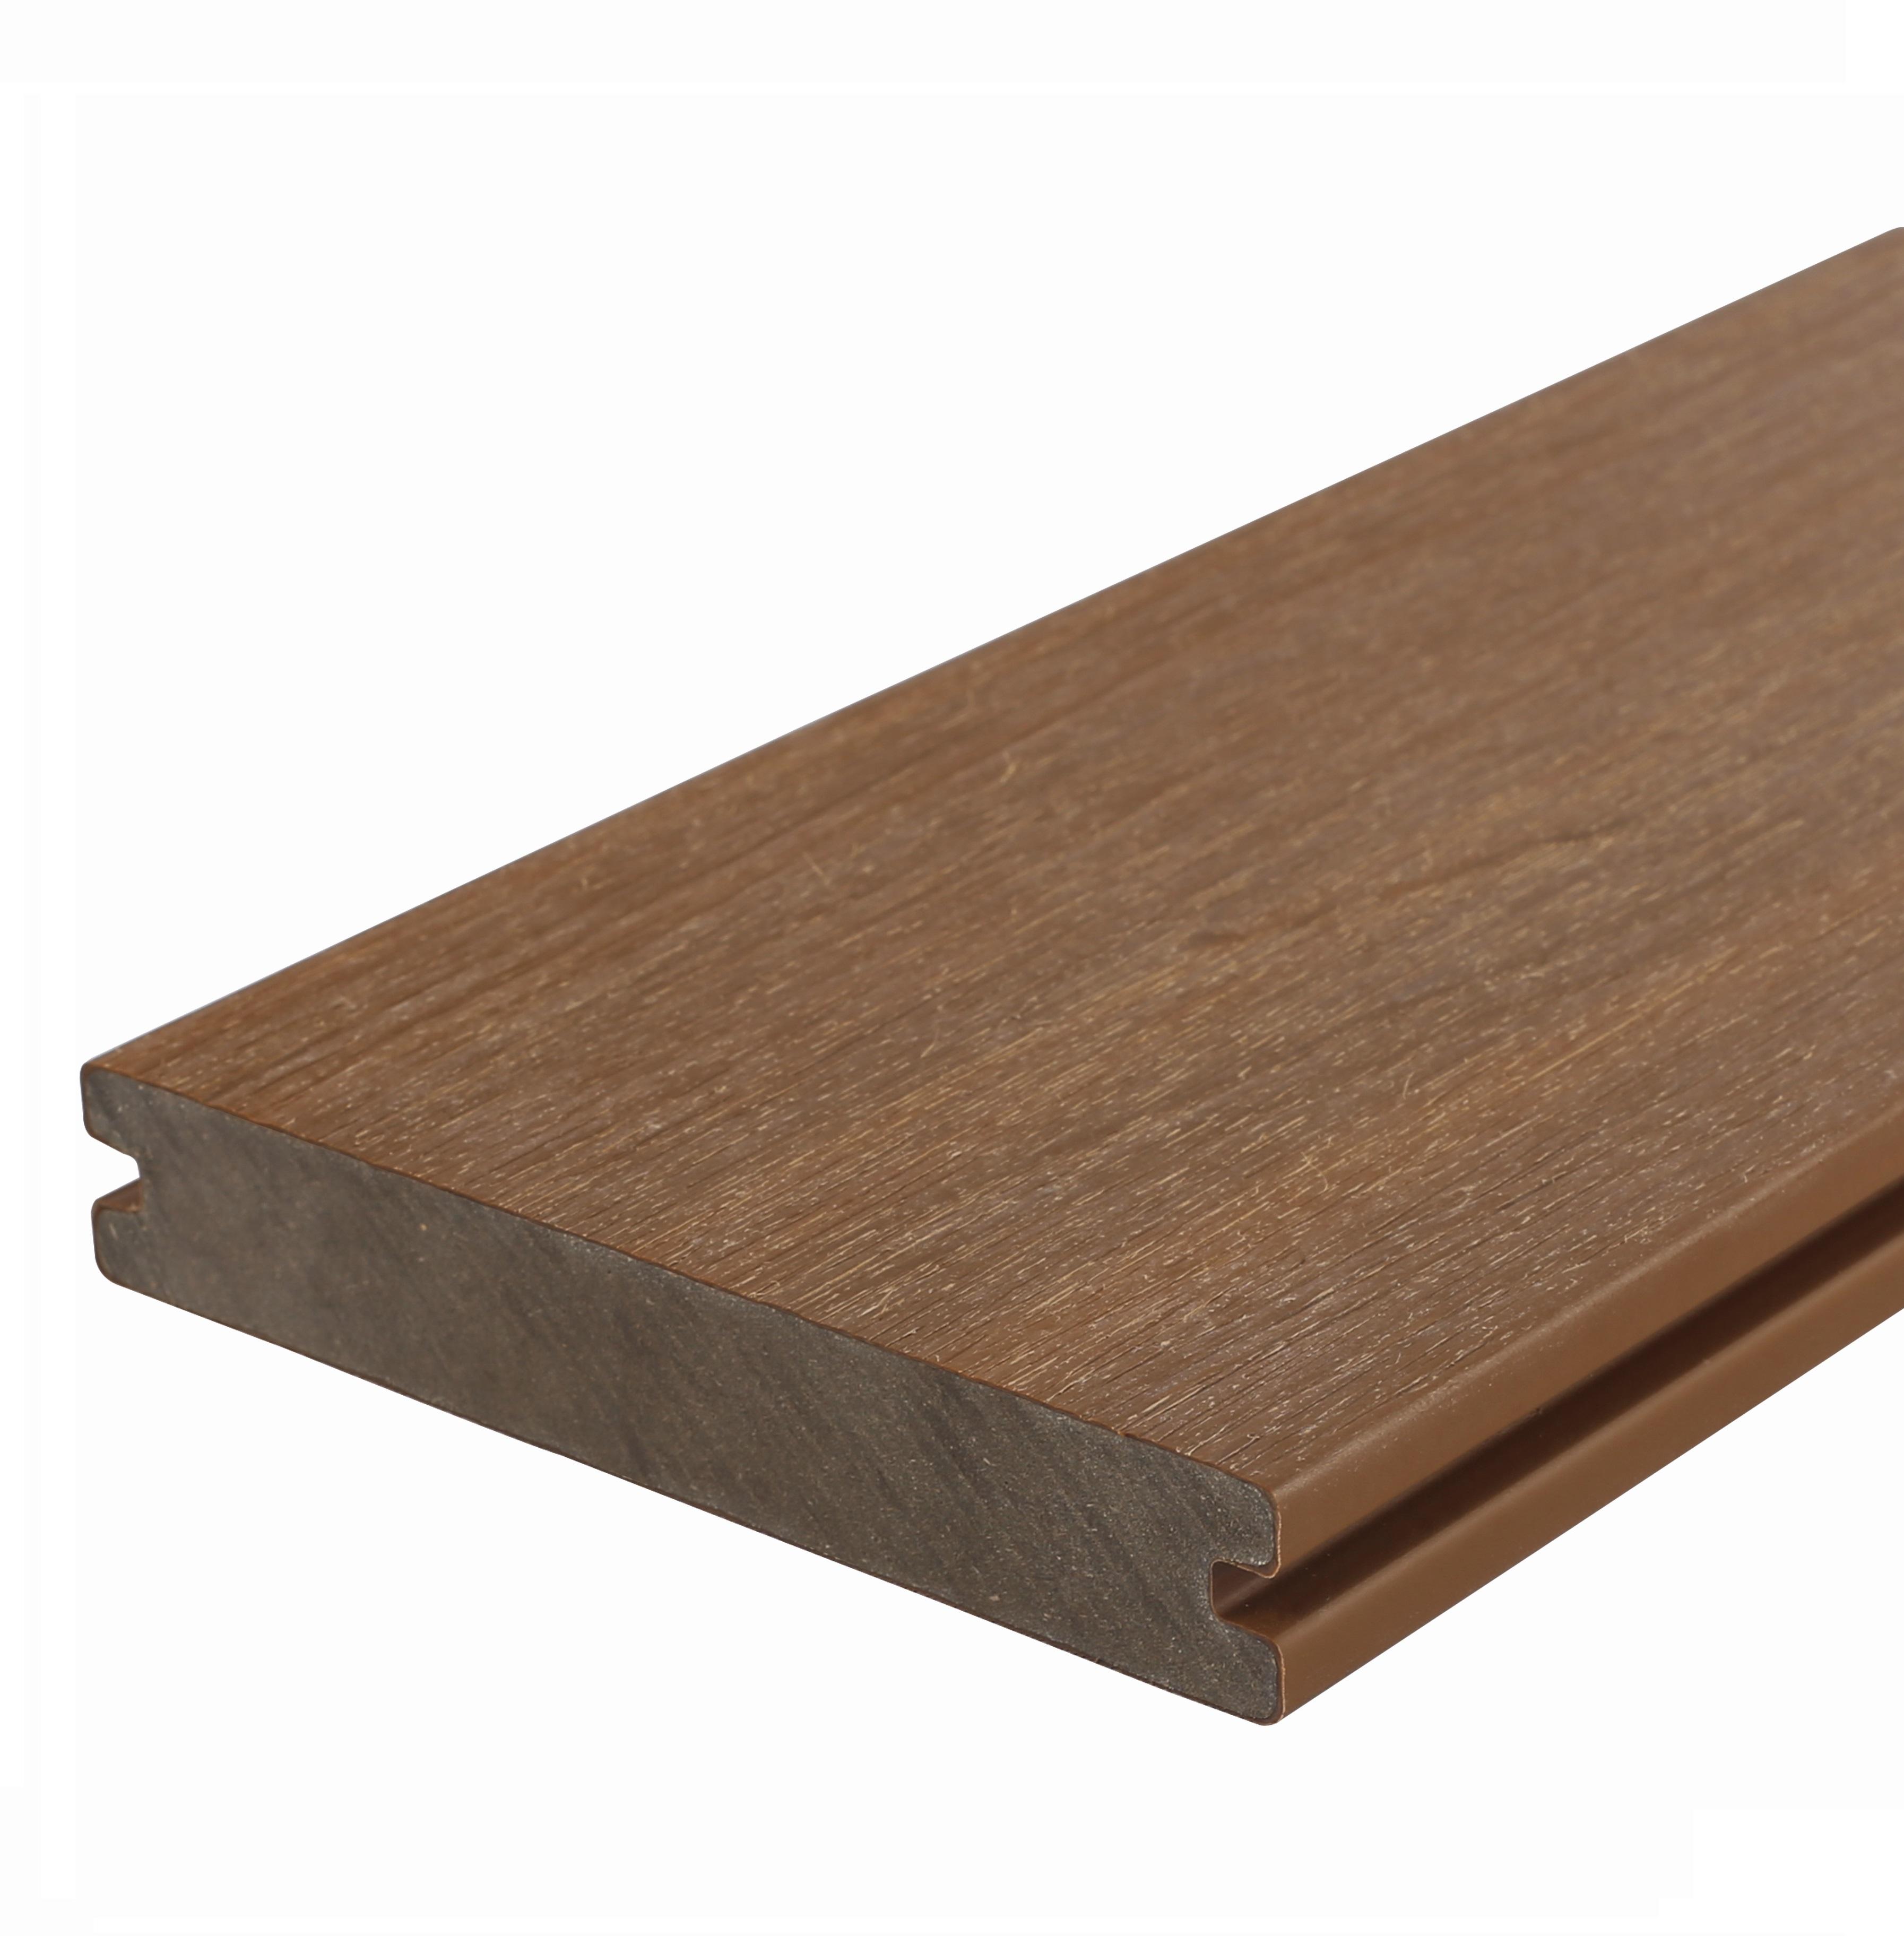 Composiet vlonderplank | Massief | 23 x 138 mm | Teak | 400 cm